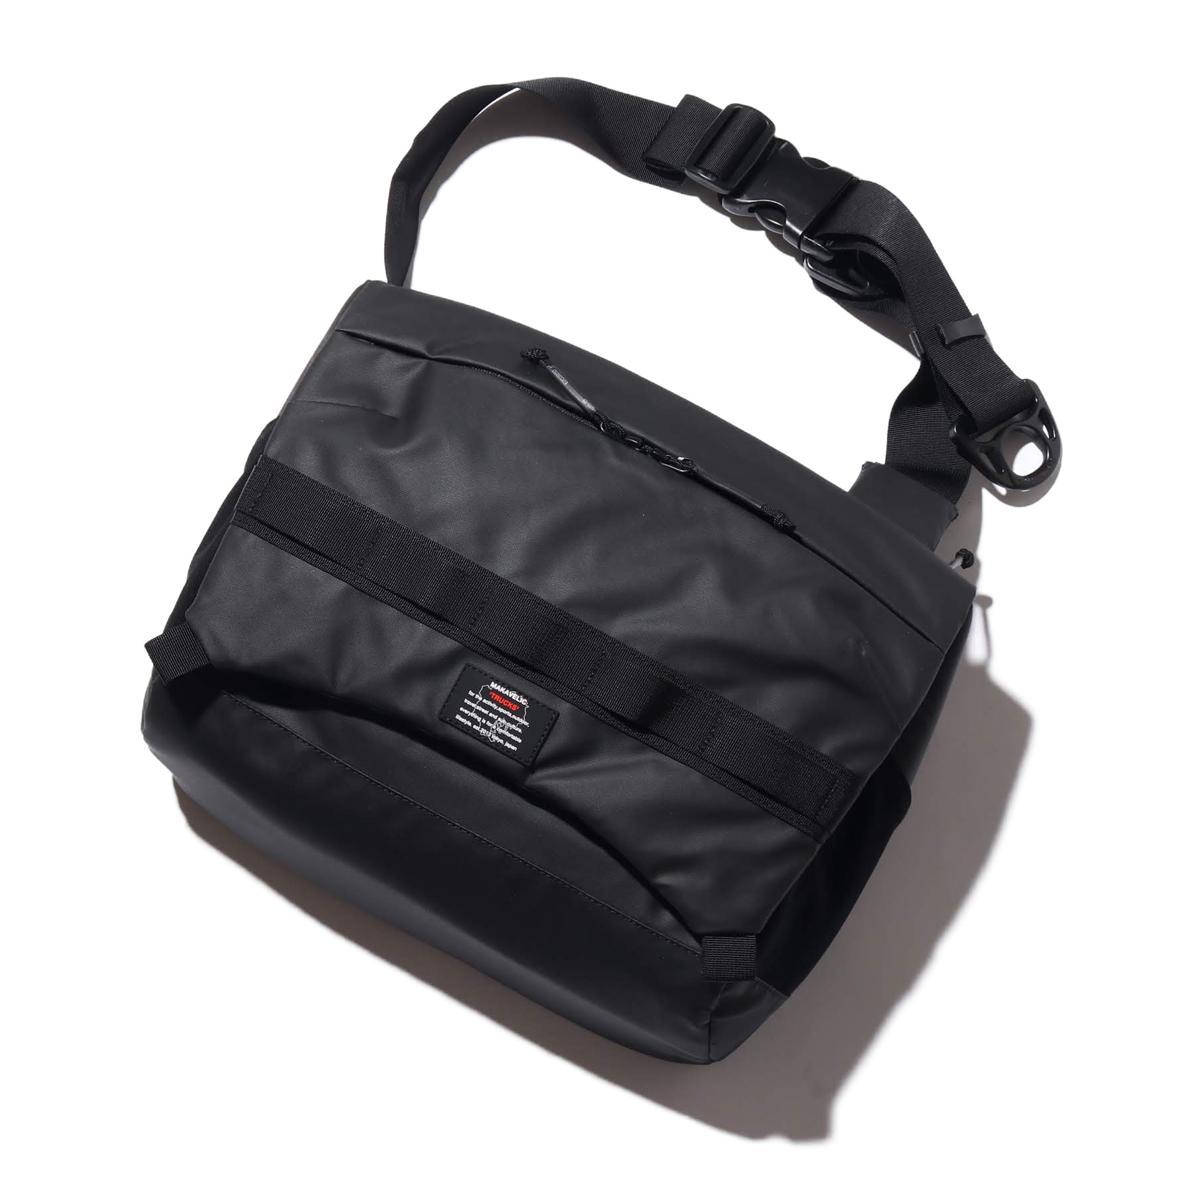 MAKAVELIC RAISE SHOULDER BAG(マキャベリック レイズ ショルダーバッグ)BLACK【メンズ ショルダーバッグ】19FA-I